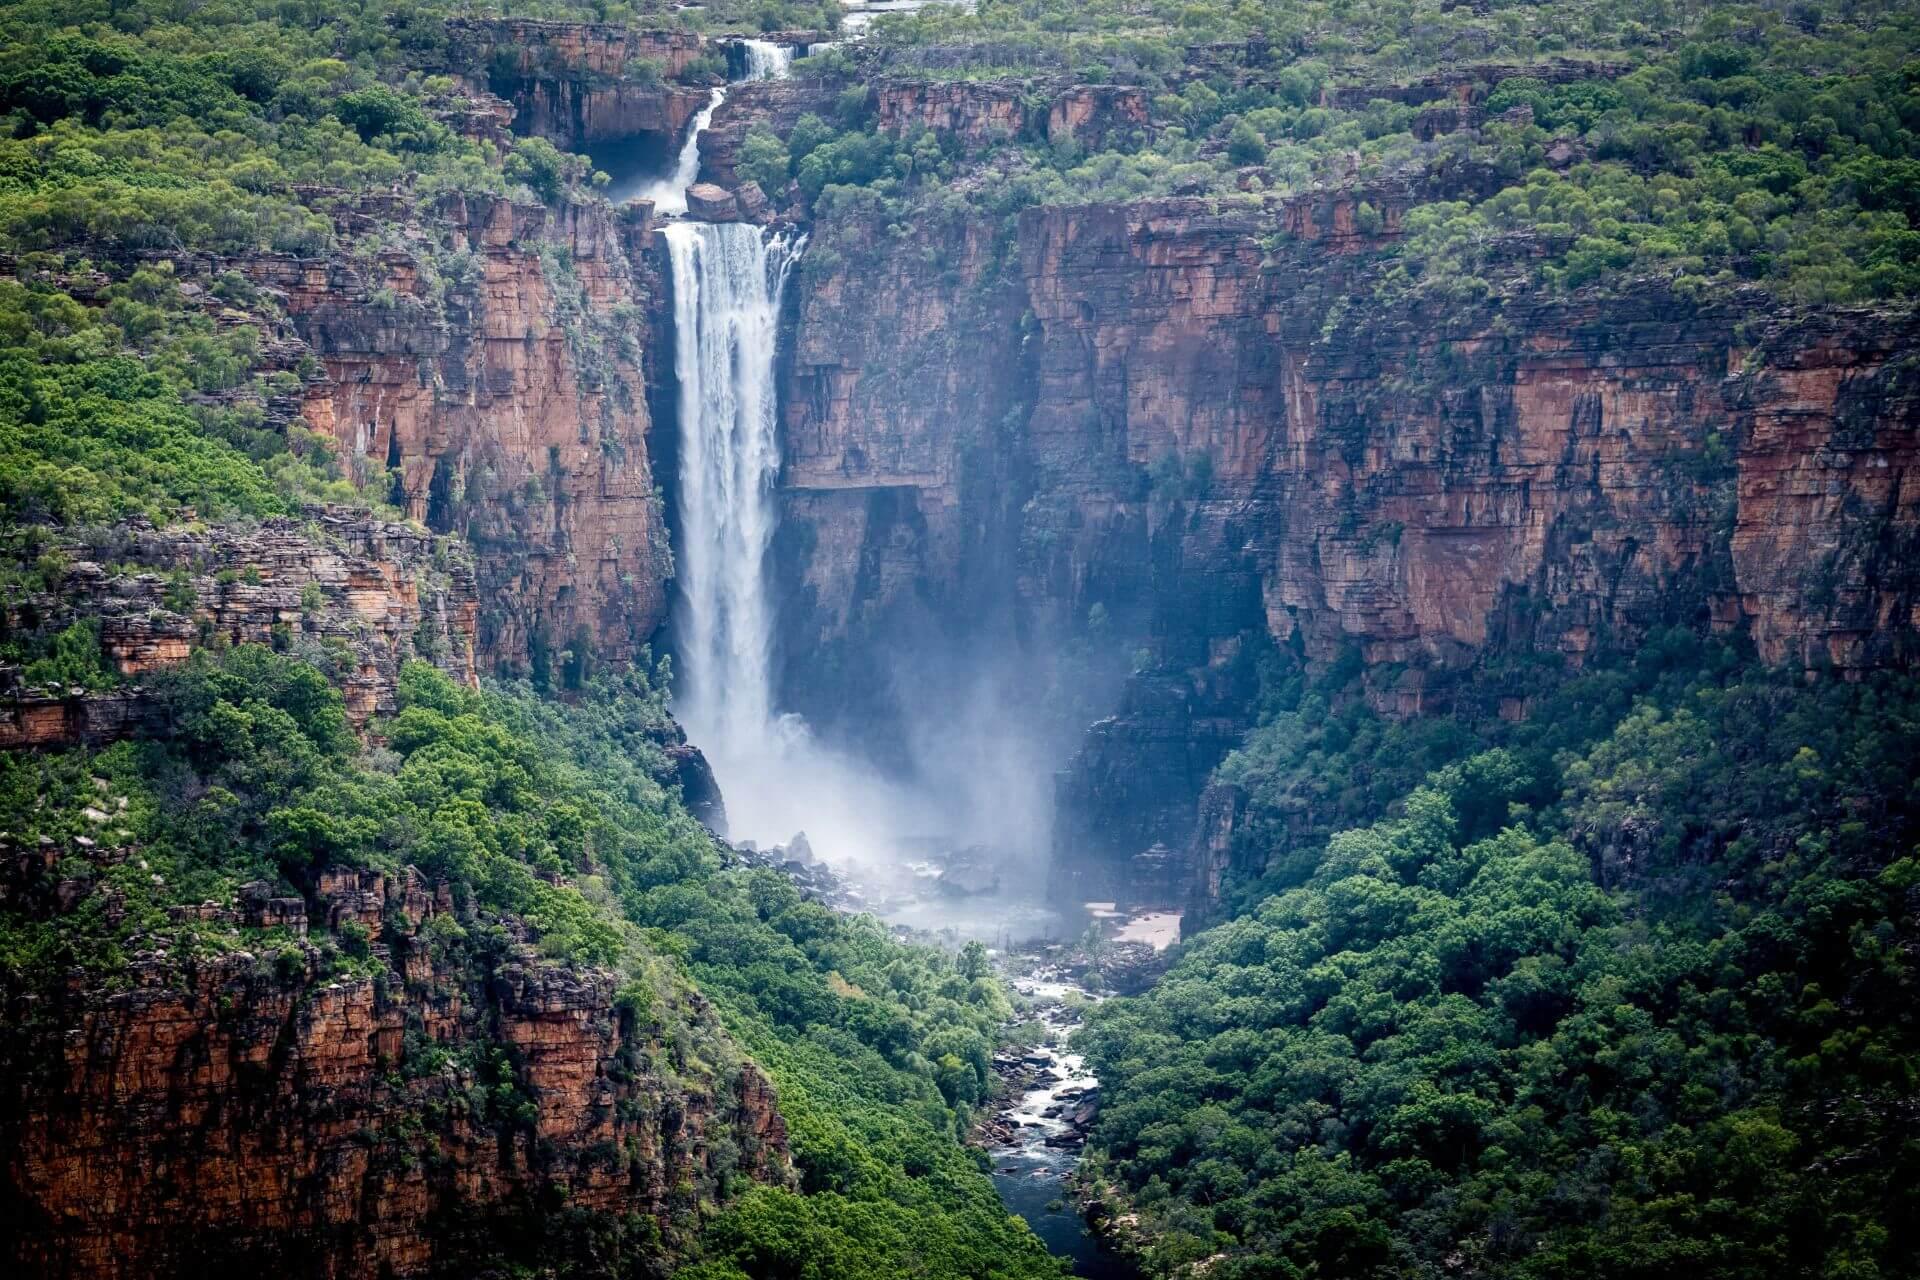 Der Jim Jim Wasserfall im Kakadu Nationalpark